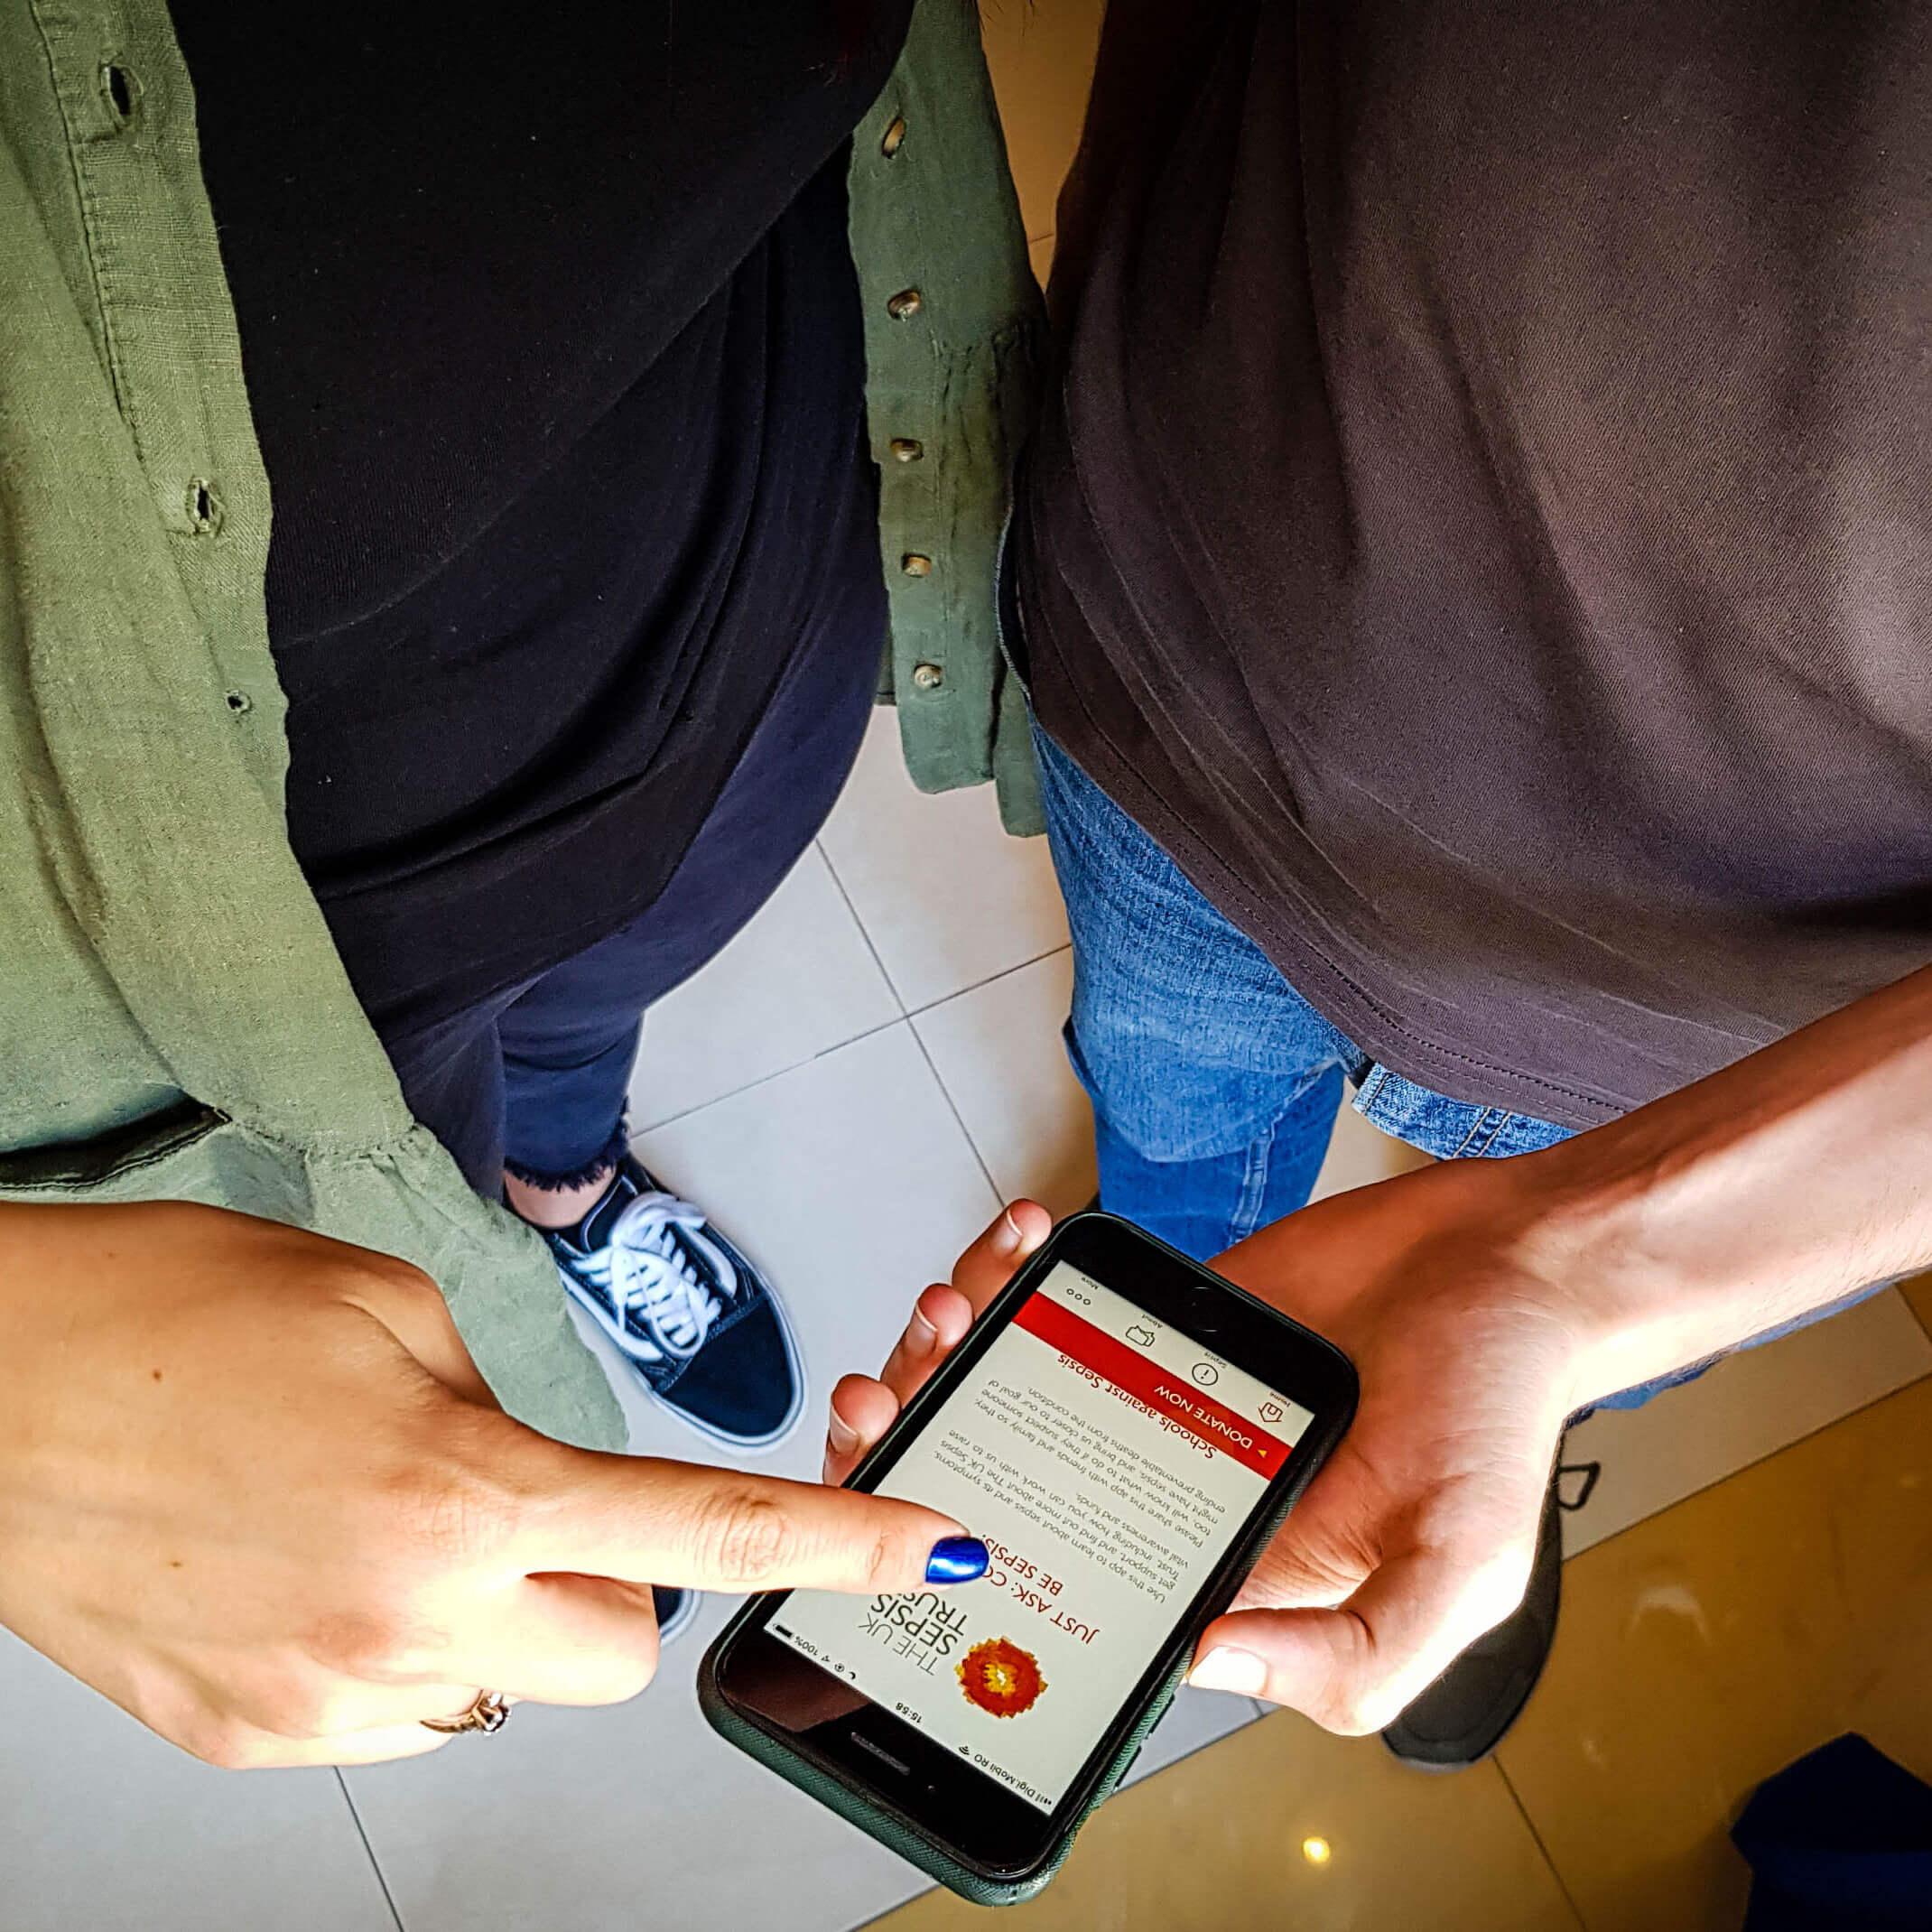 iOS/Android app development internship